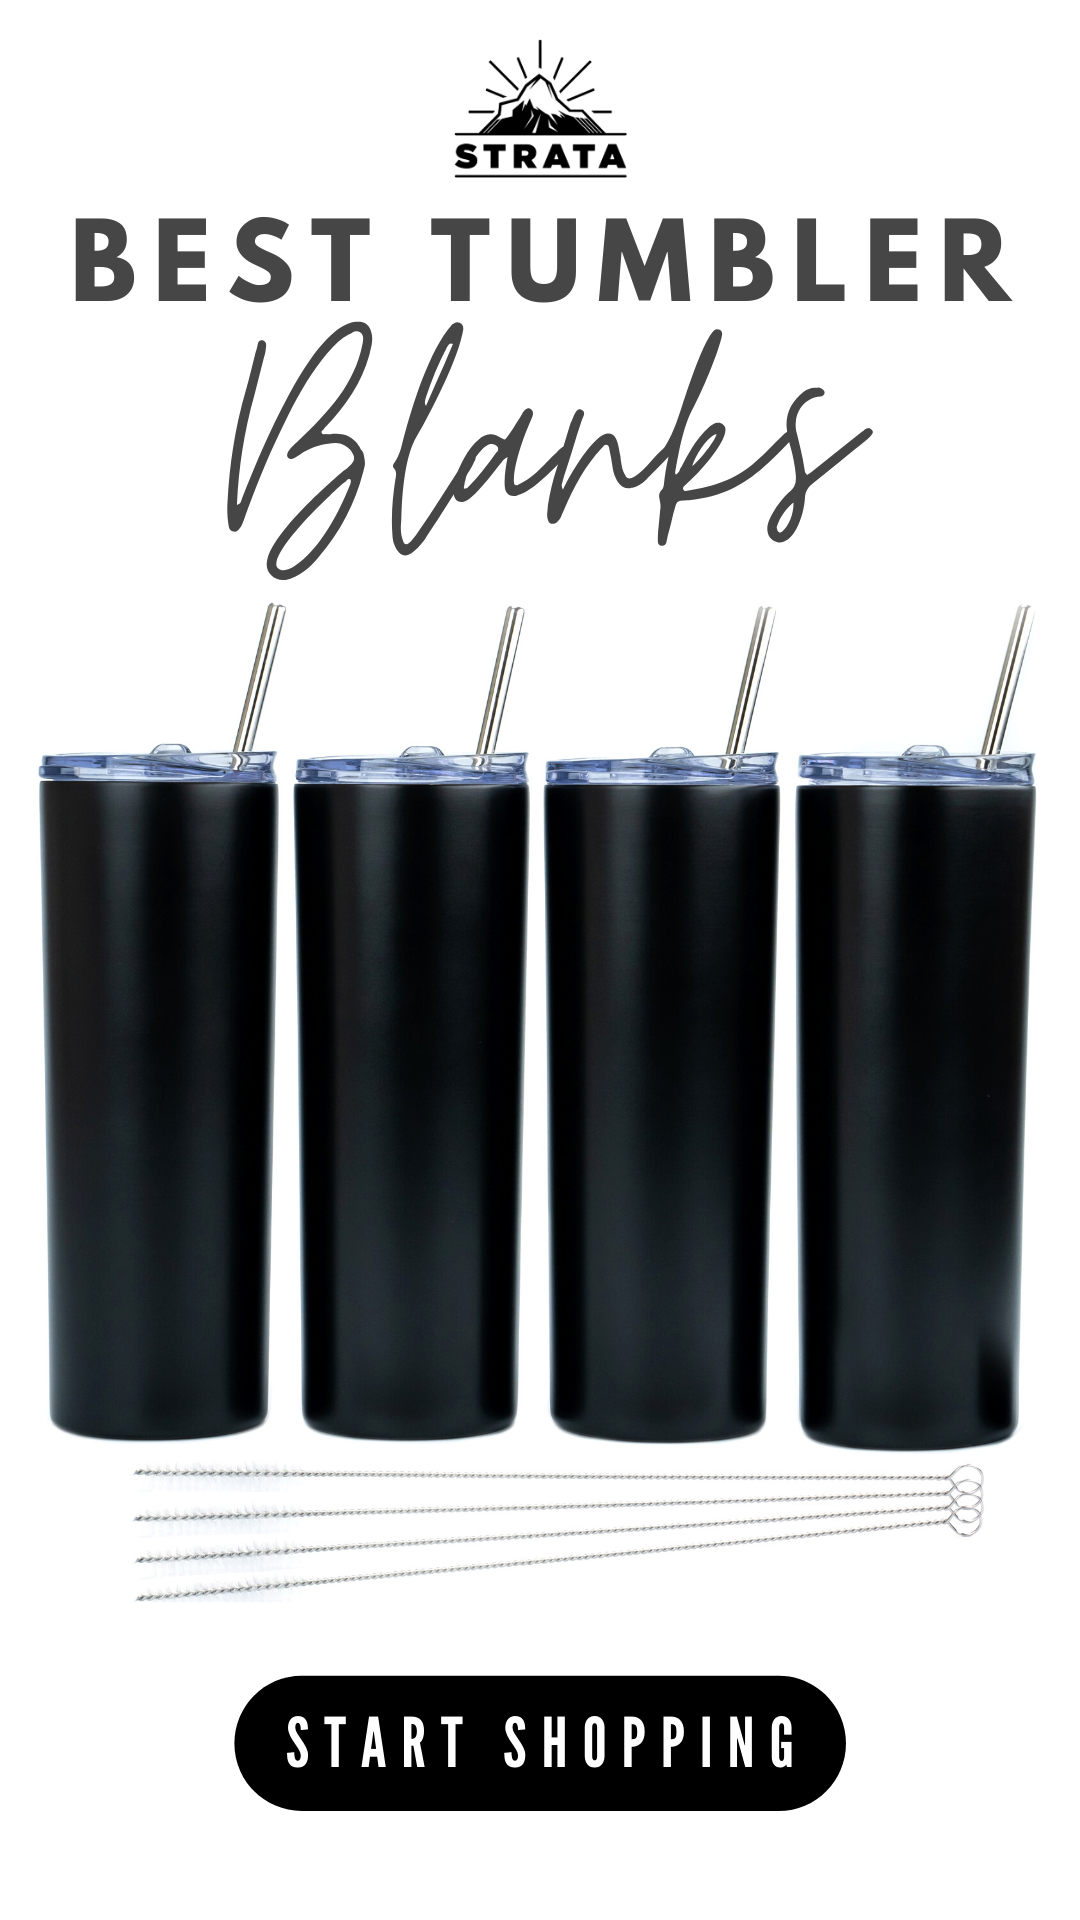 Matte Black 20 Oz Stainless Steel Skinny Tumblers By Strata Cups Travel Water Bottles In 2020 Skinny Tumblers Vinyl Tumblers Reusable Cup